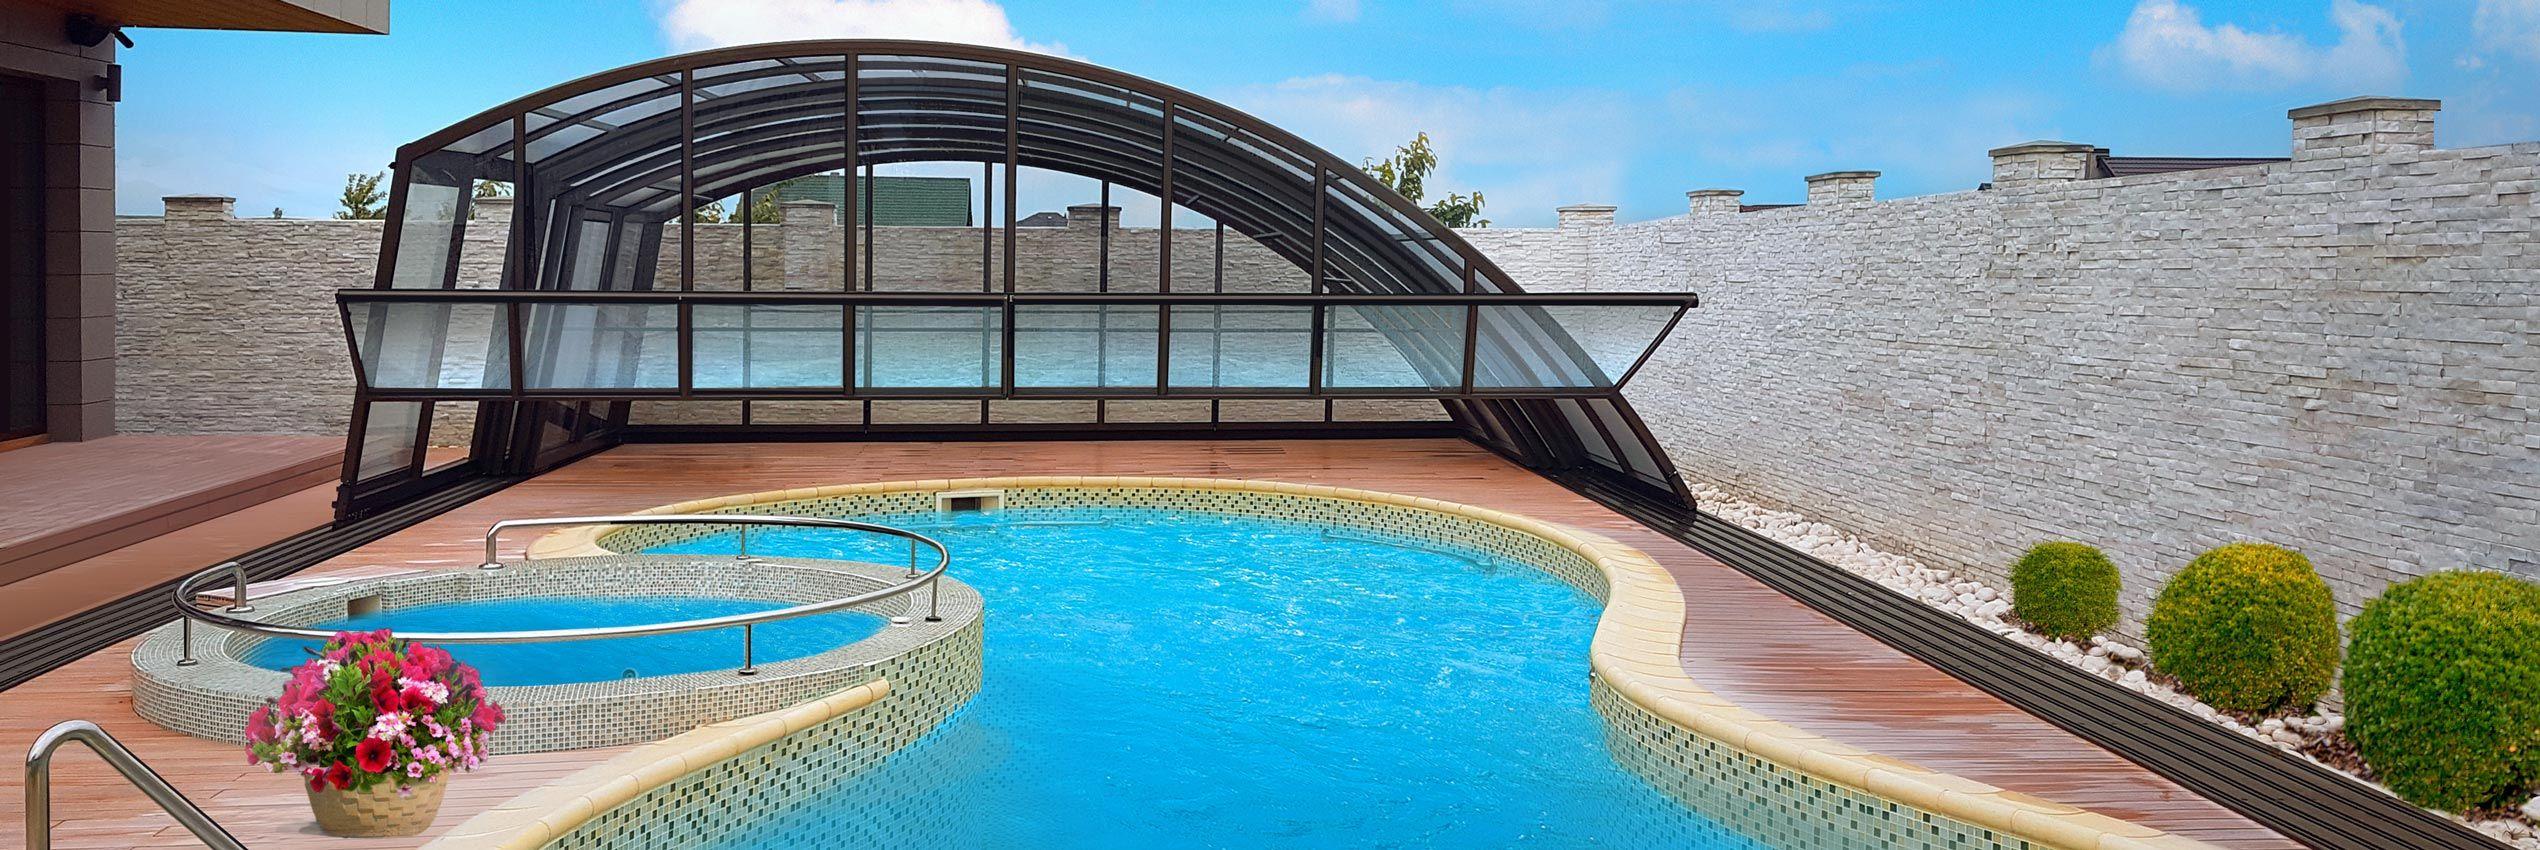 Abri de piscine ravena for Abri de piscine 33